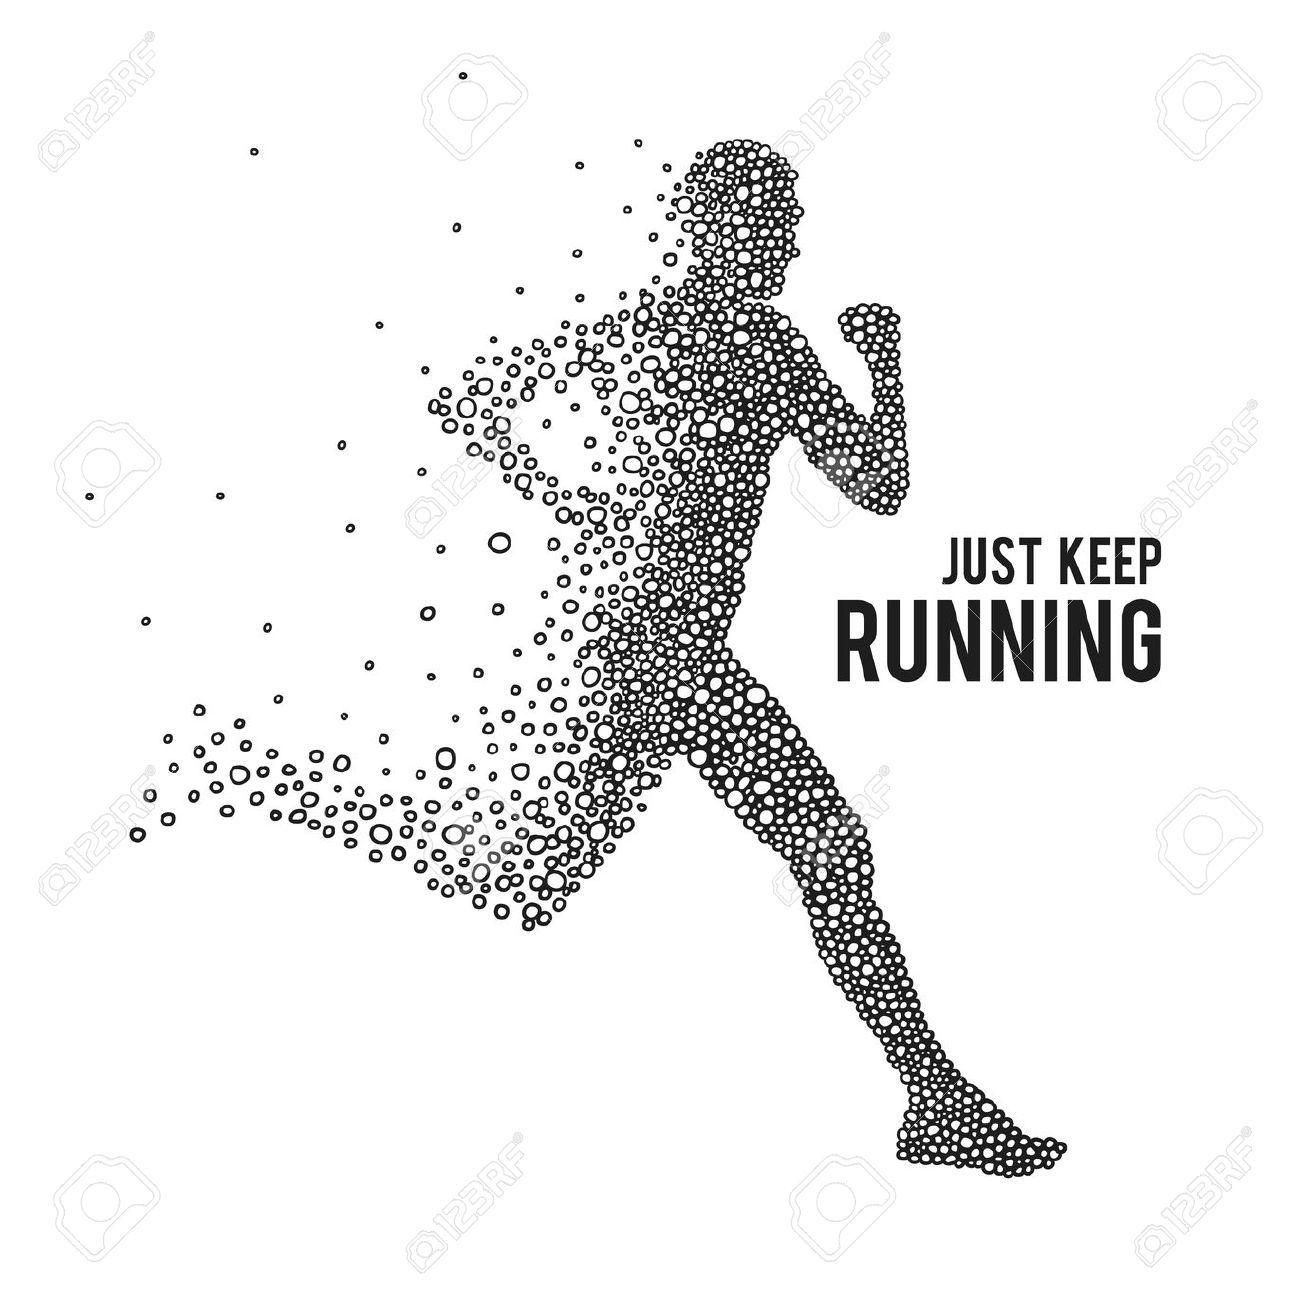 Trail Stock Illustrations Cliparts And Royalty Free Trail Vectors Running Tattoo Running Logo Running Illustration